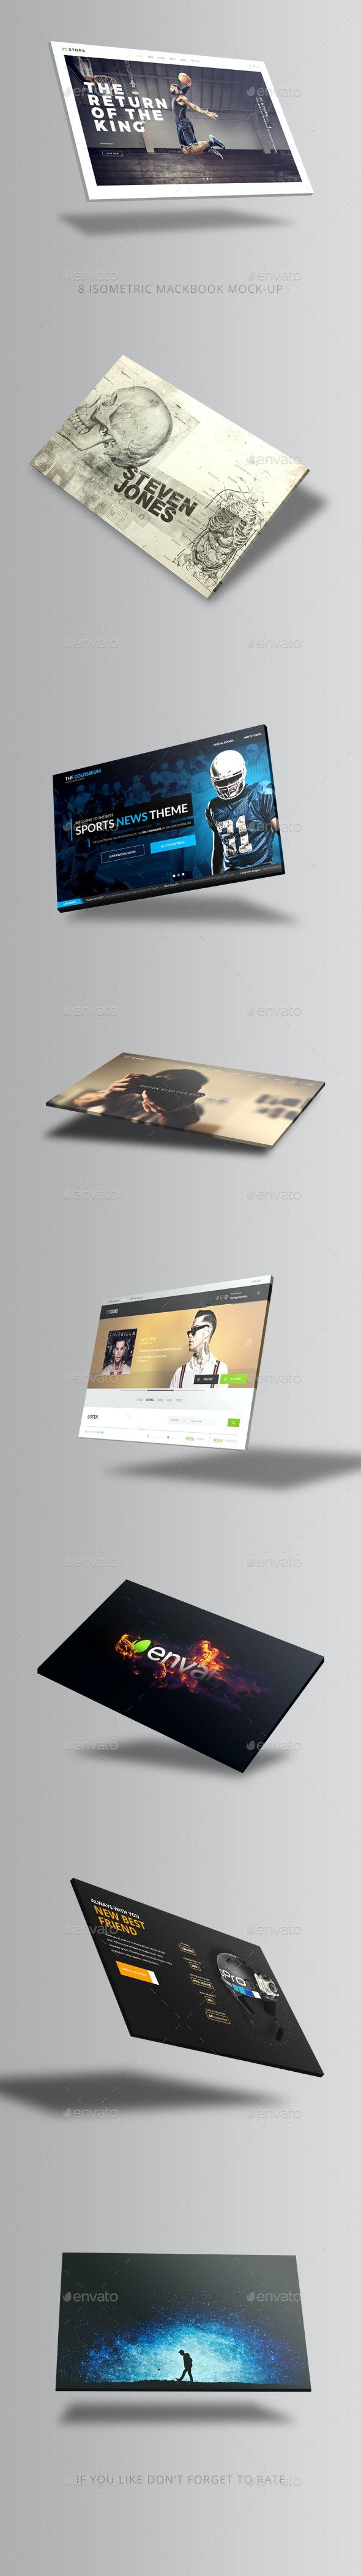 Isometric Laptop Mockup - Laptop Displays